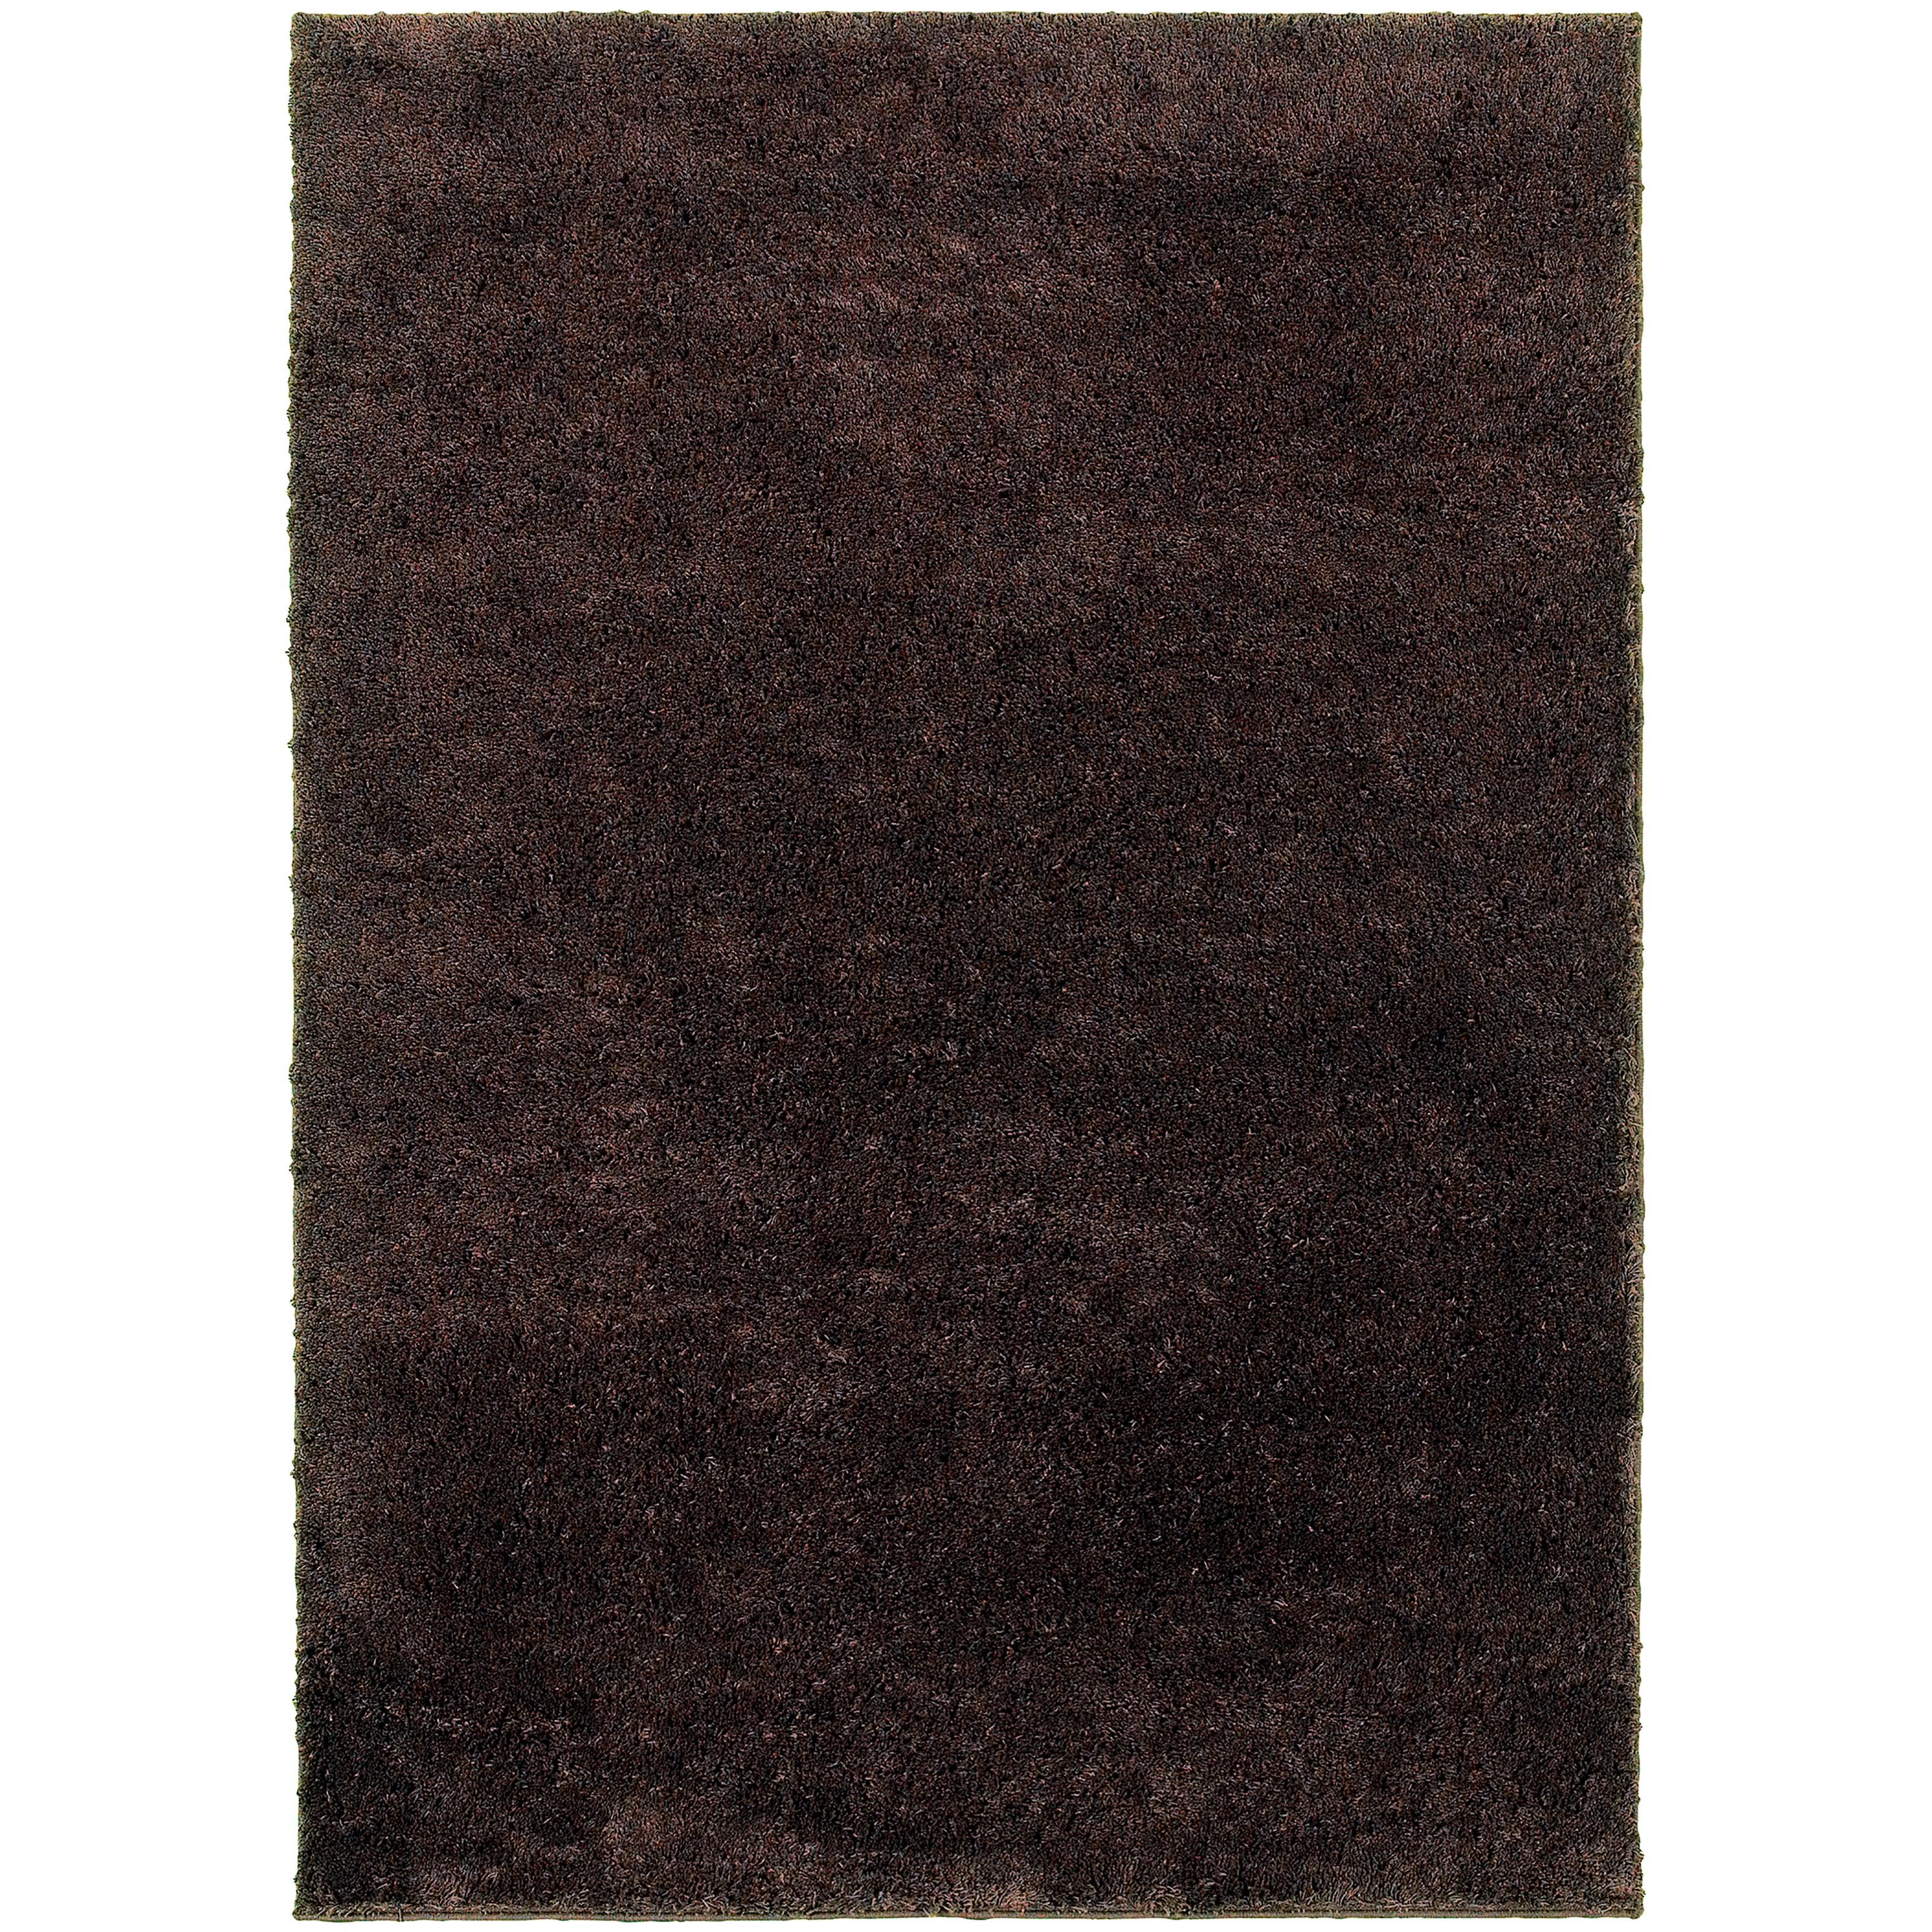 "Oriental Weavers Impressions 6' 7"" X  9' 3"" Rug - Item Number: I84500200280ST"